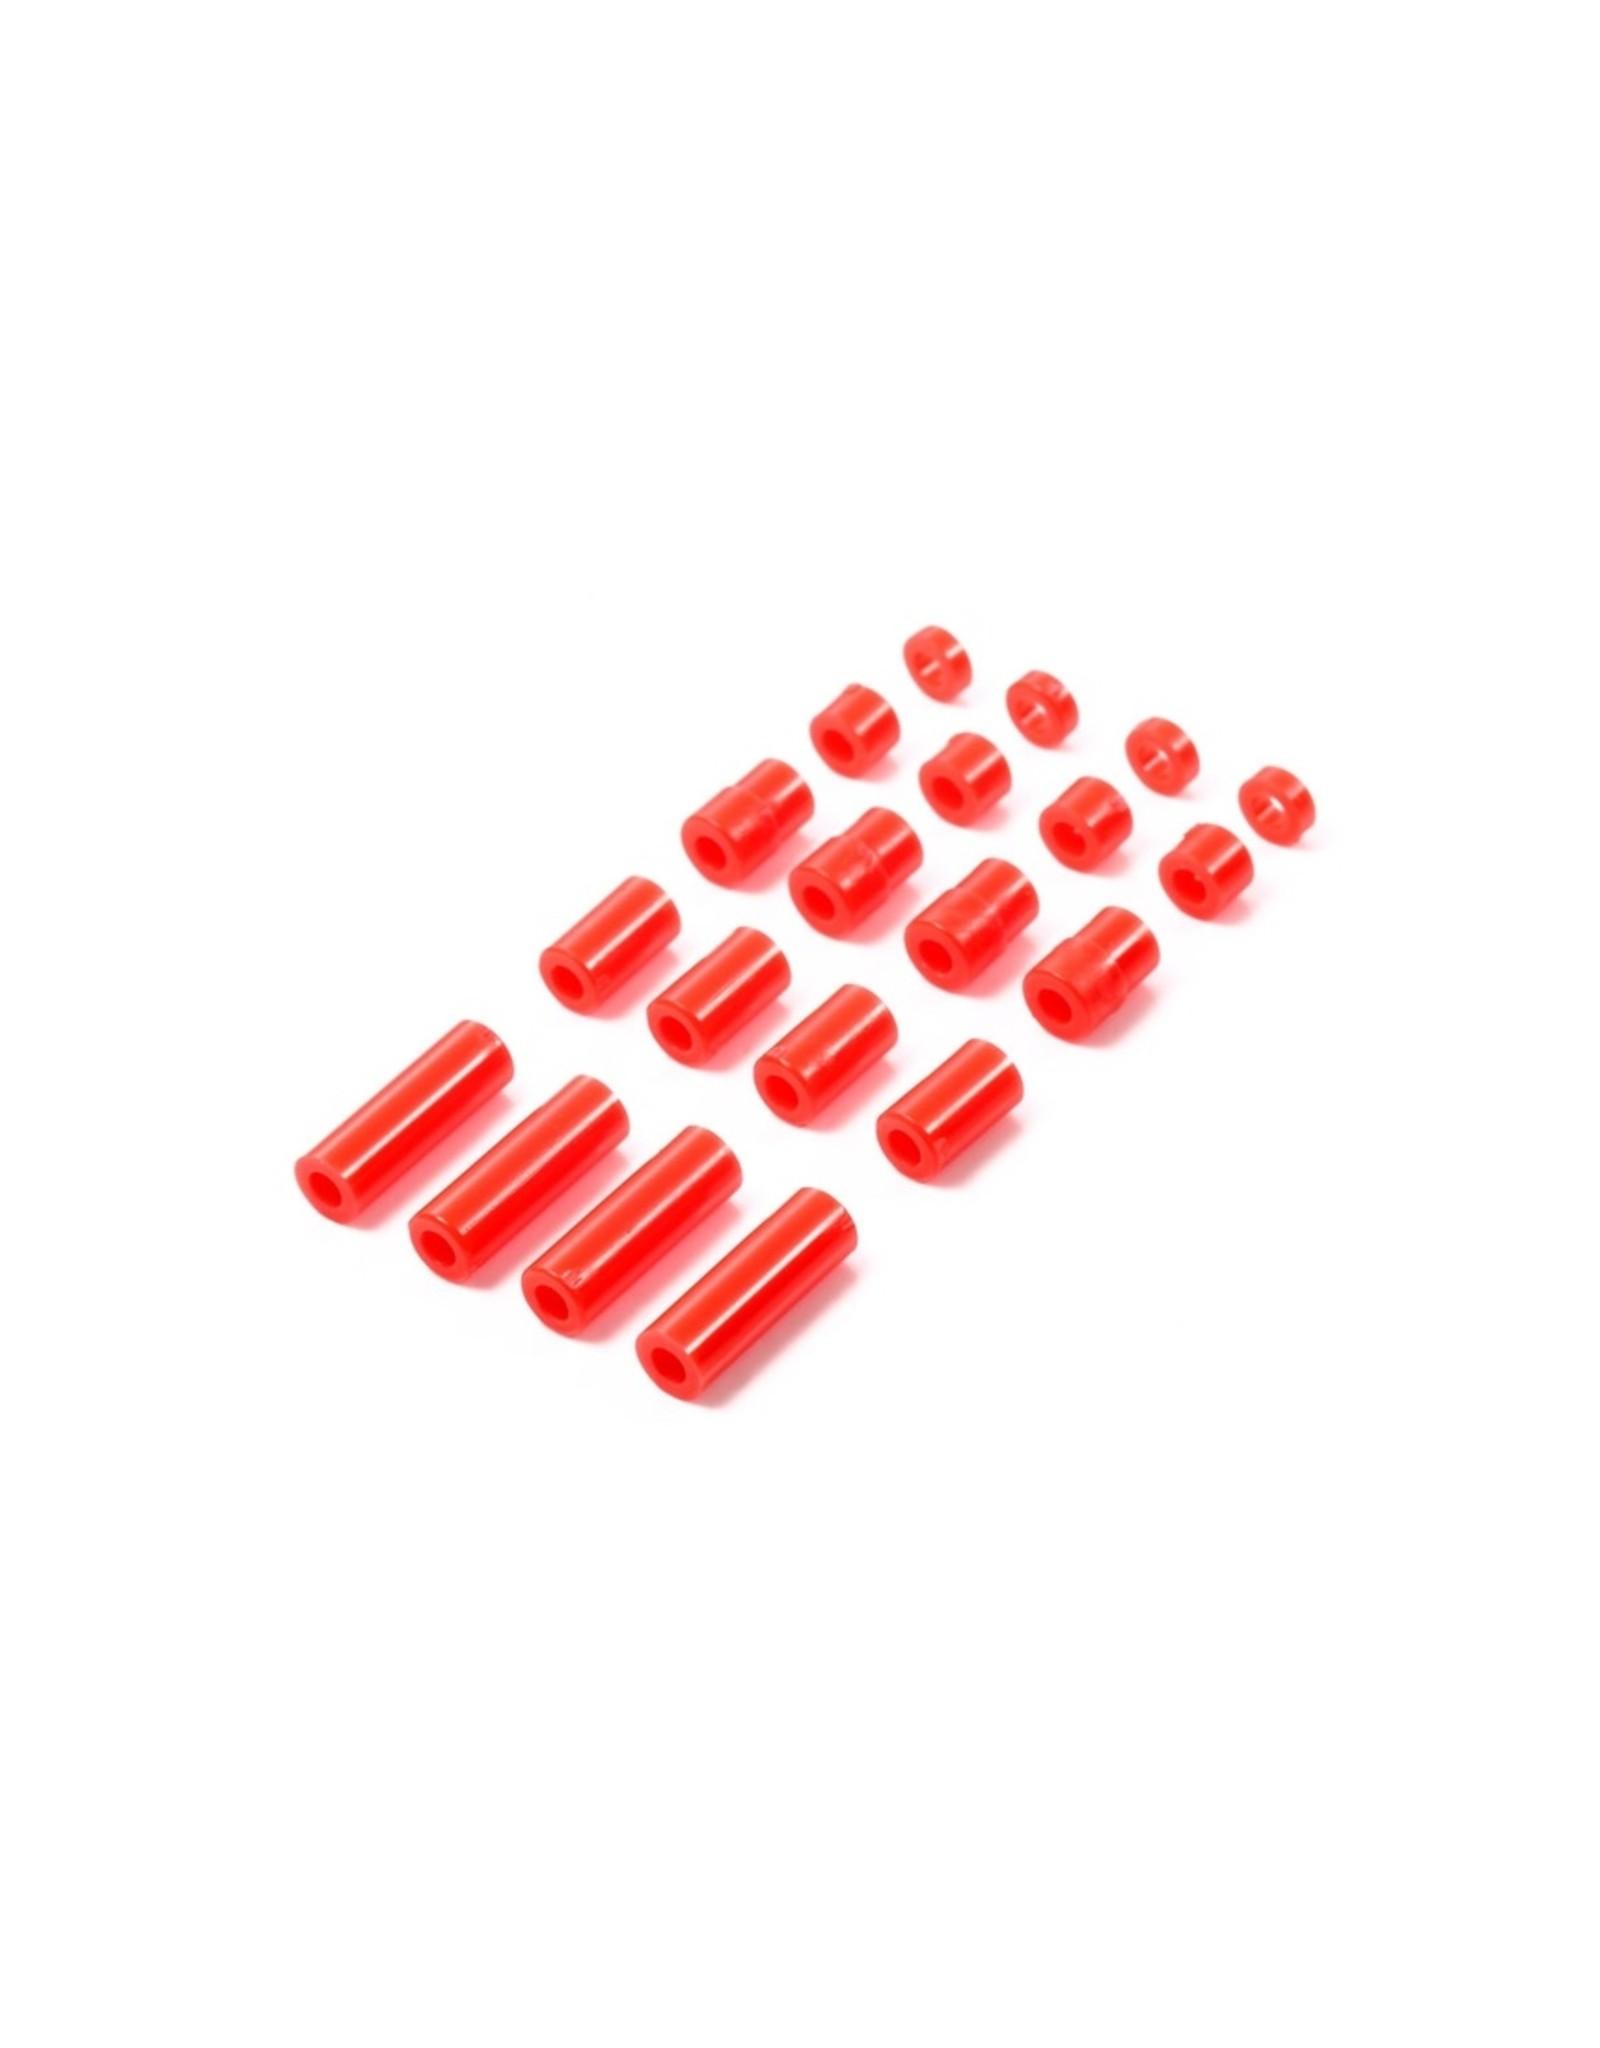 Tamiya JR LW Plastic Spacer Set - 12/6.7/6/3/1.5mm (Red)  (TAM95400)